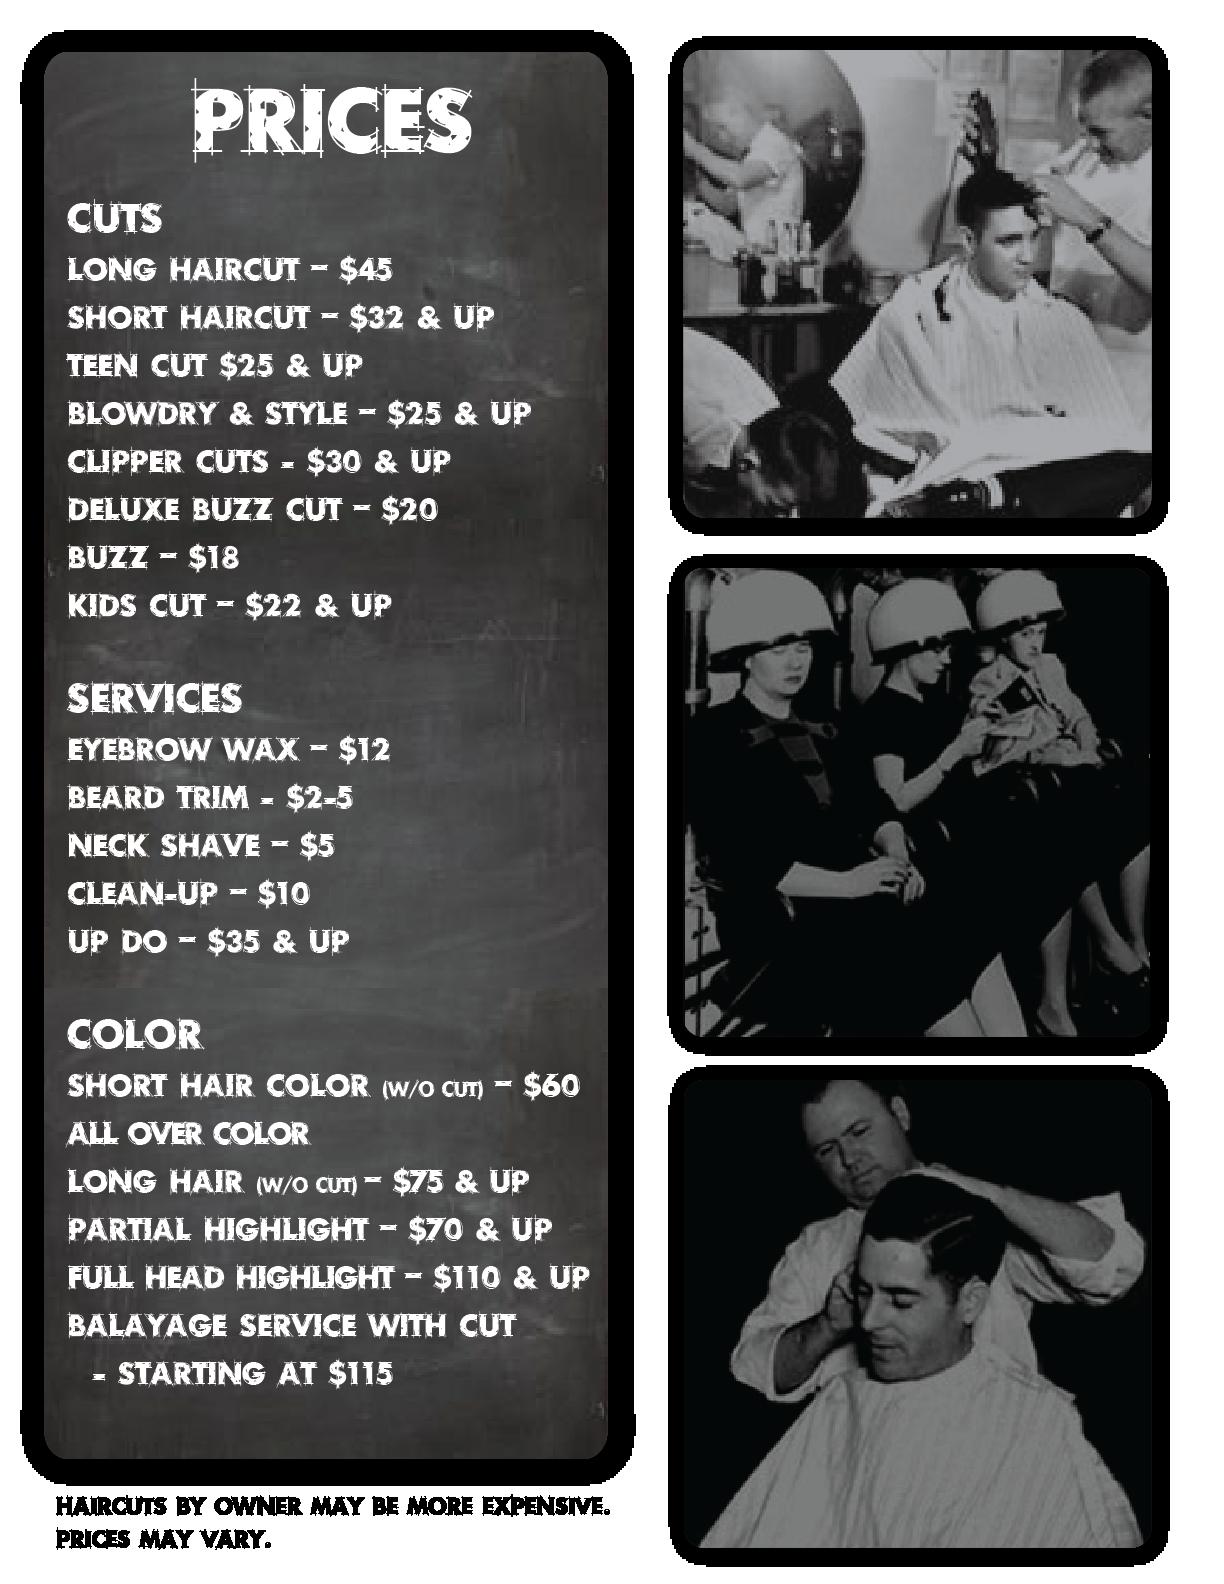 Prices5.10.2020